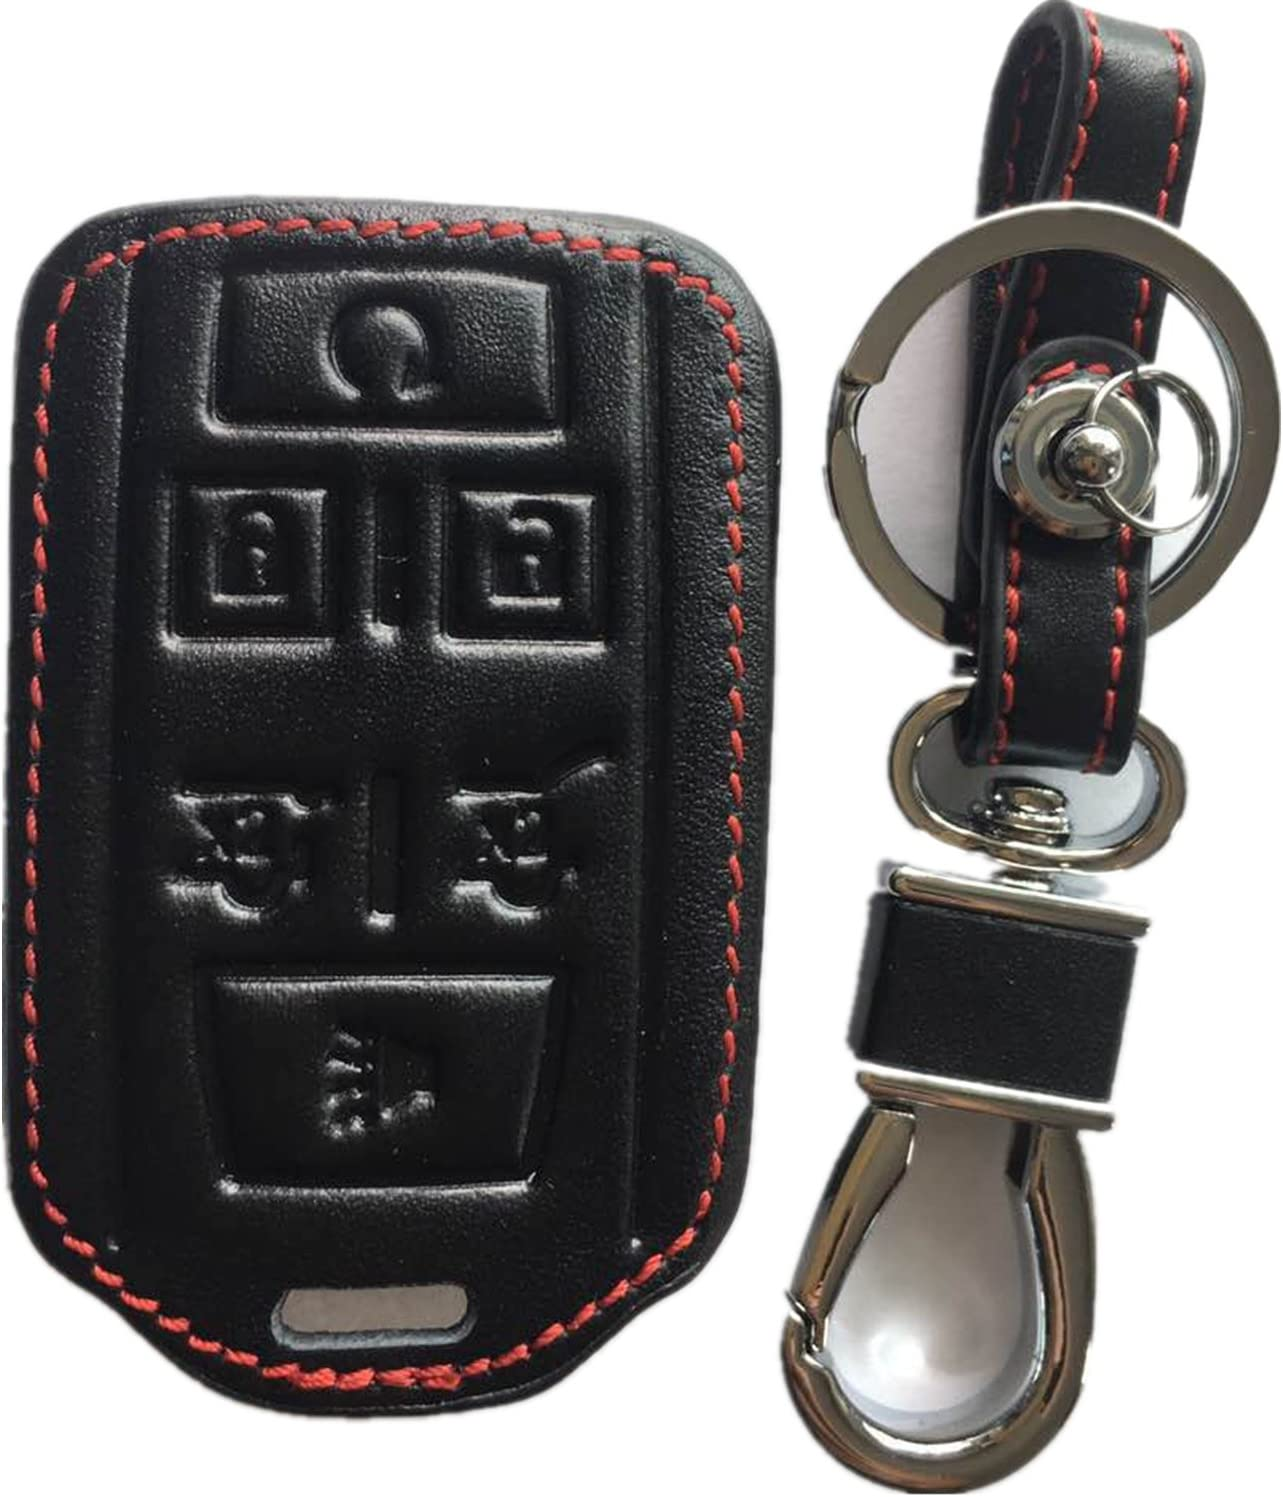 RPKEY Leather Keyless Entry Remote Control Key Fob Cover Case Protector for Chevrolet Silverado 1500 2500 HD 3500 HD Suburban Tahoe GMC Sierra 1500 2500 HD Yukon M3N-32337100 13577766